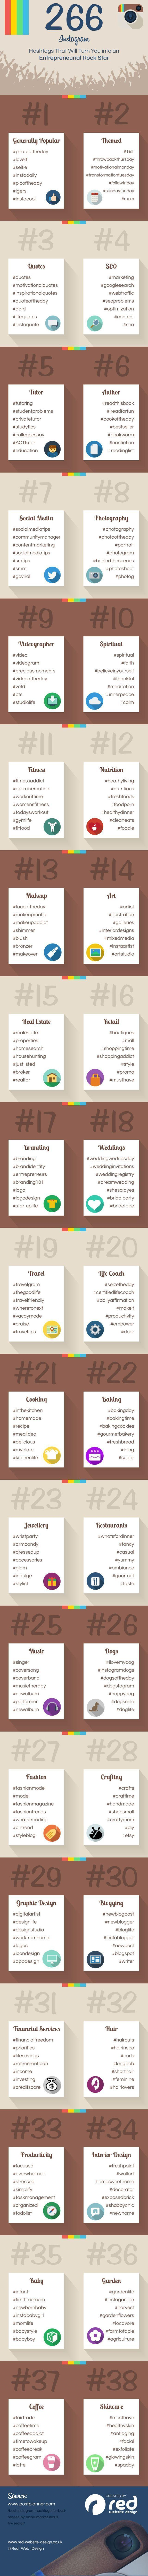 hashtag per instagram http://sophisticatedincome.com/about-our-company/